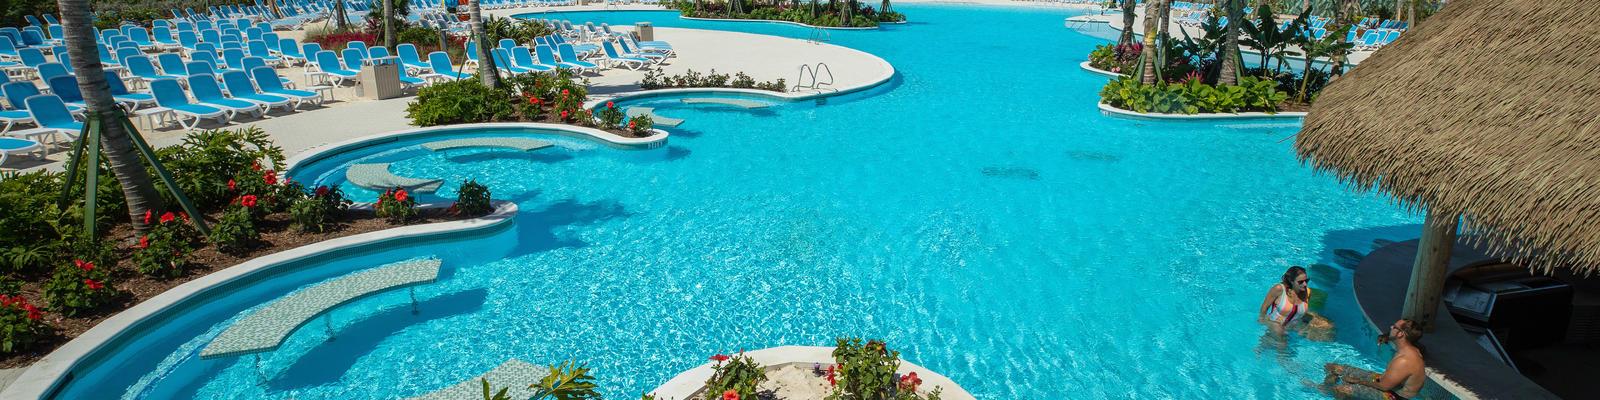 Royal Caribbean Unveils 'Perfect Day' Pool at CocoCay (Photo: Royal Caribbean)